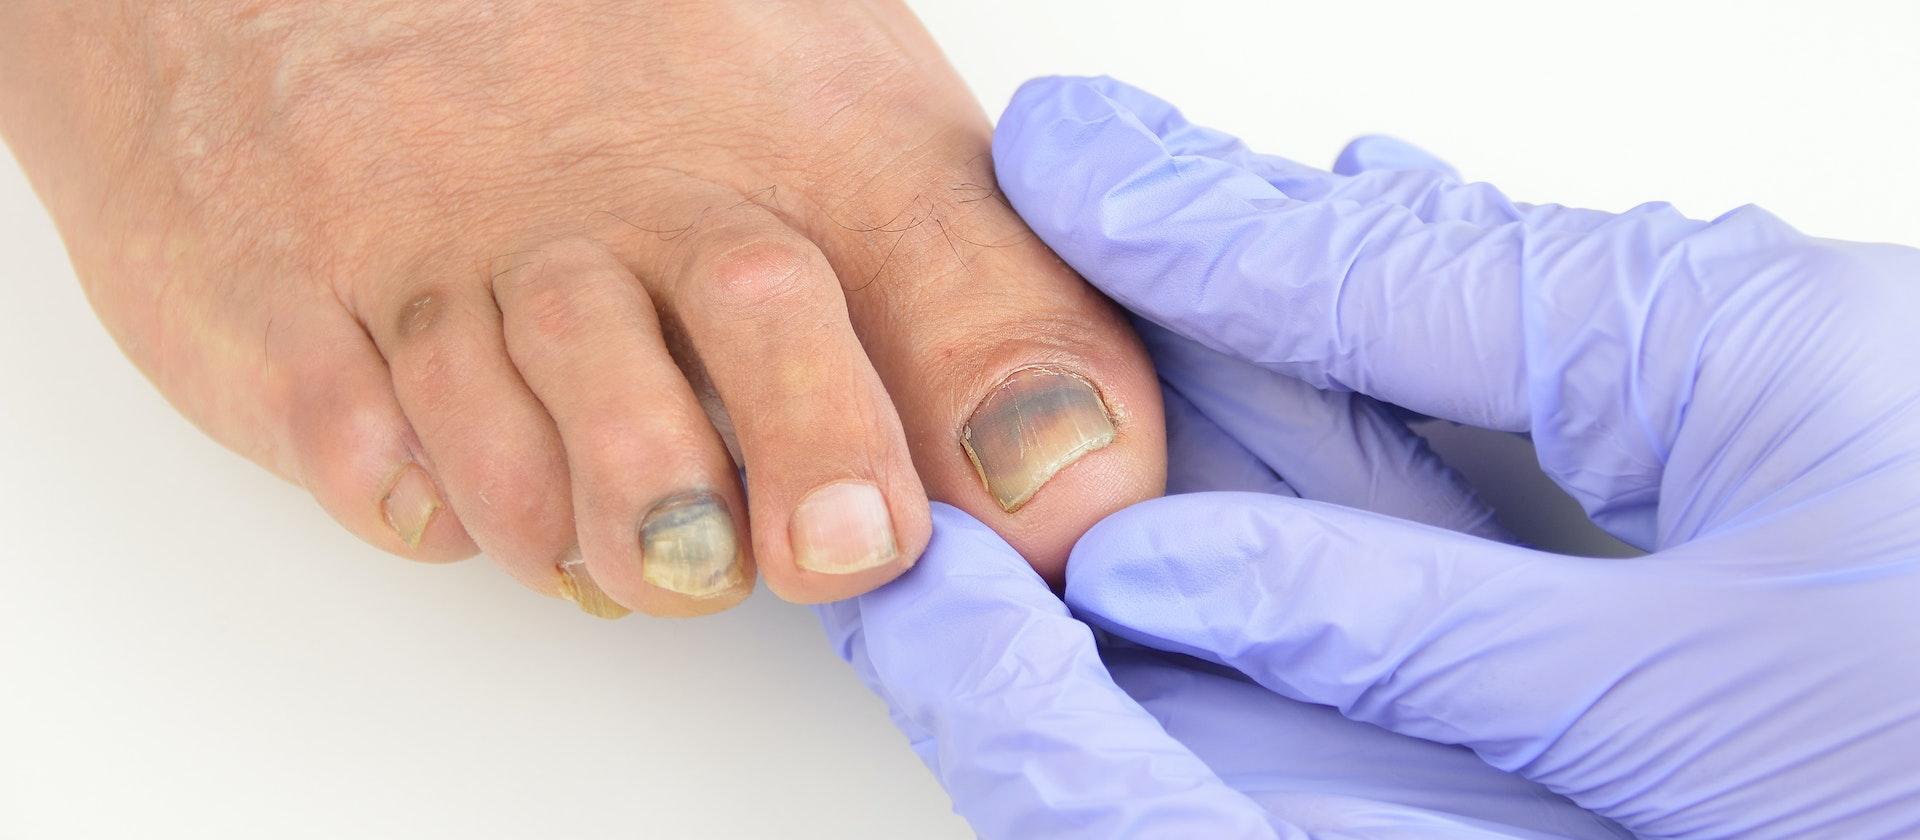 A Person Experiencing Toenail Pain Symptoms